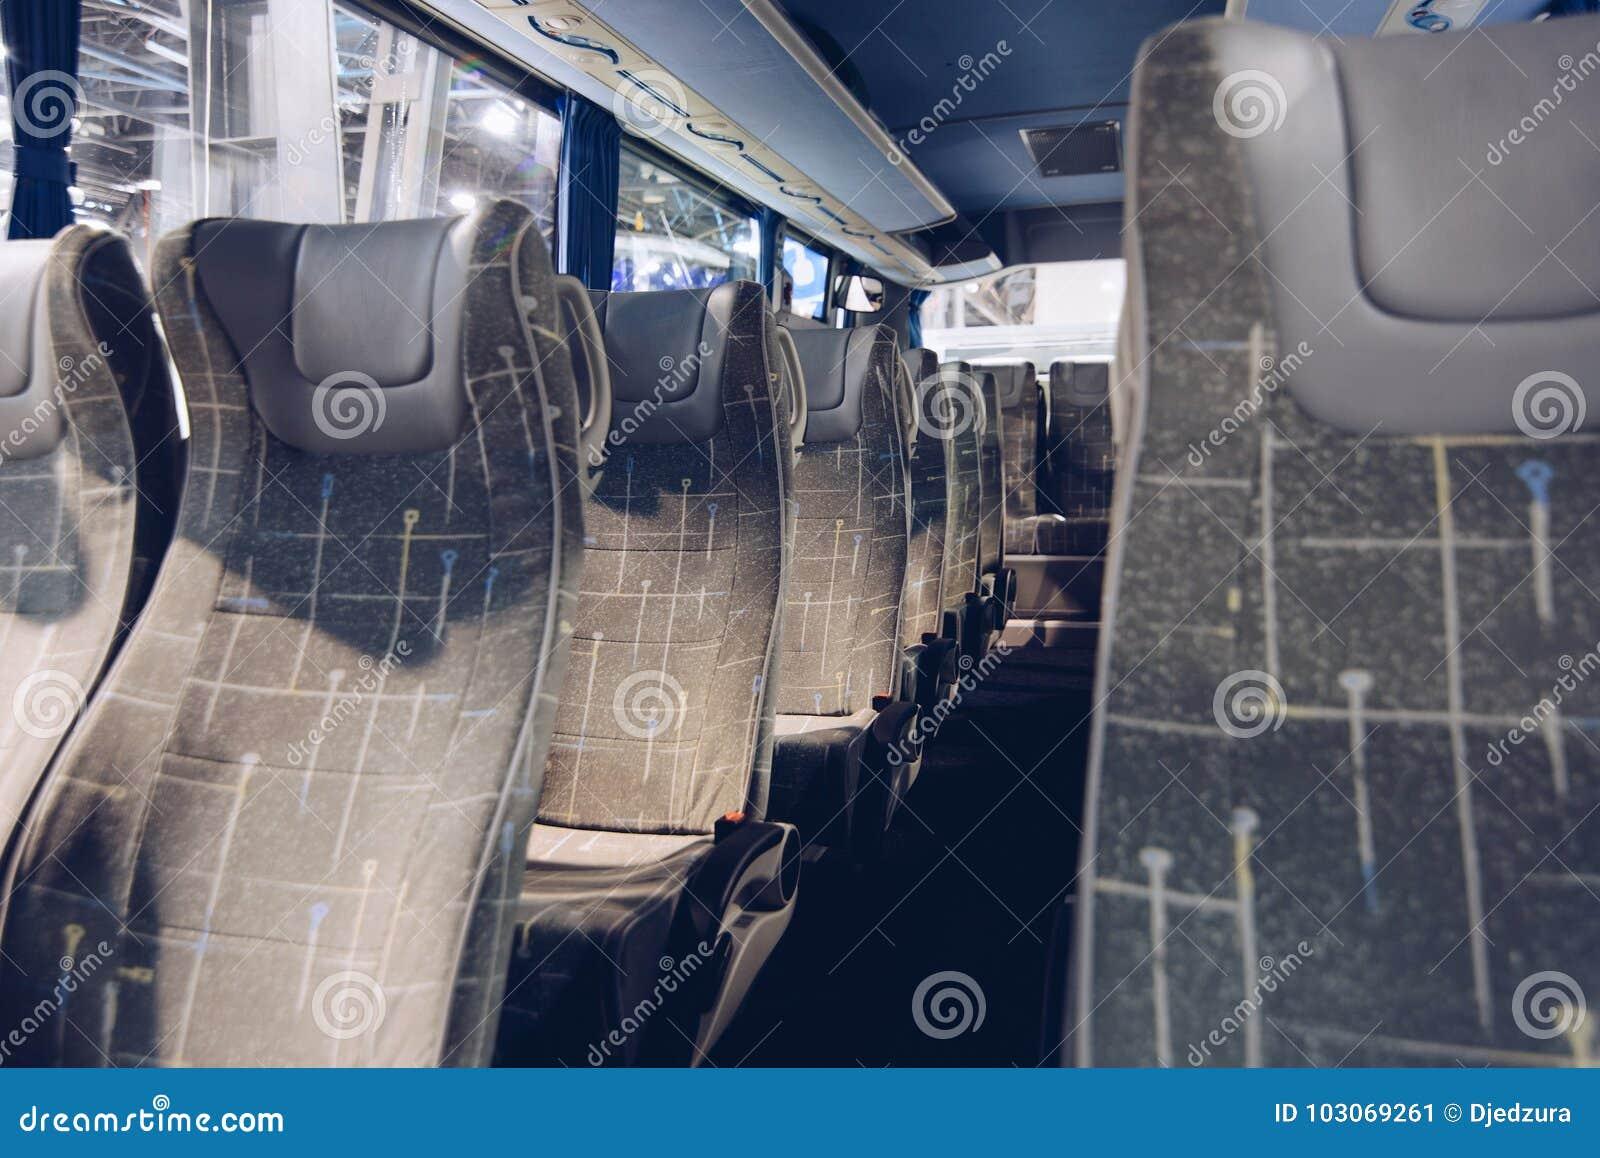 Seats in modern coach bus.